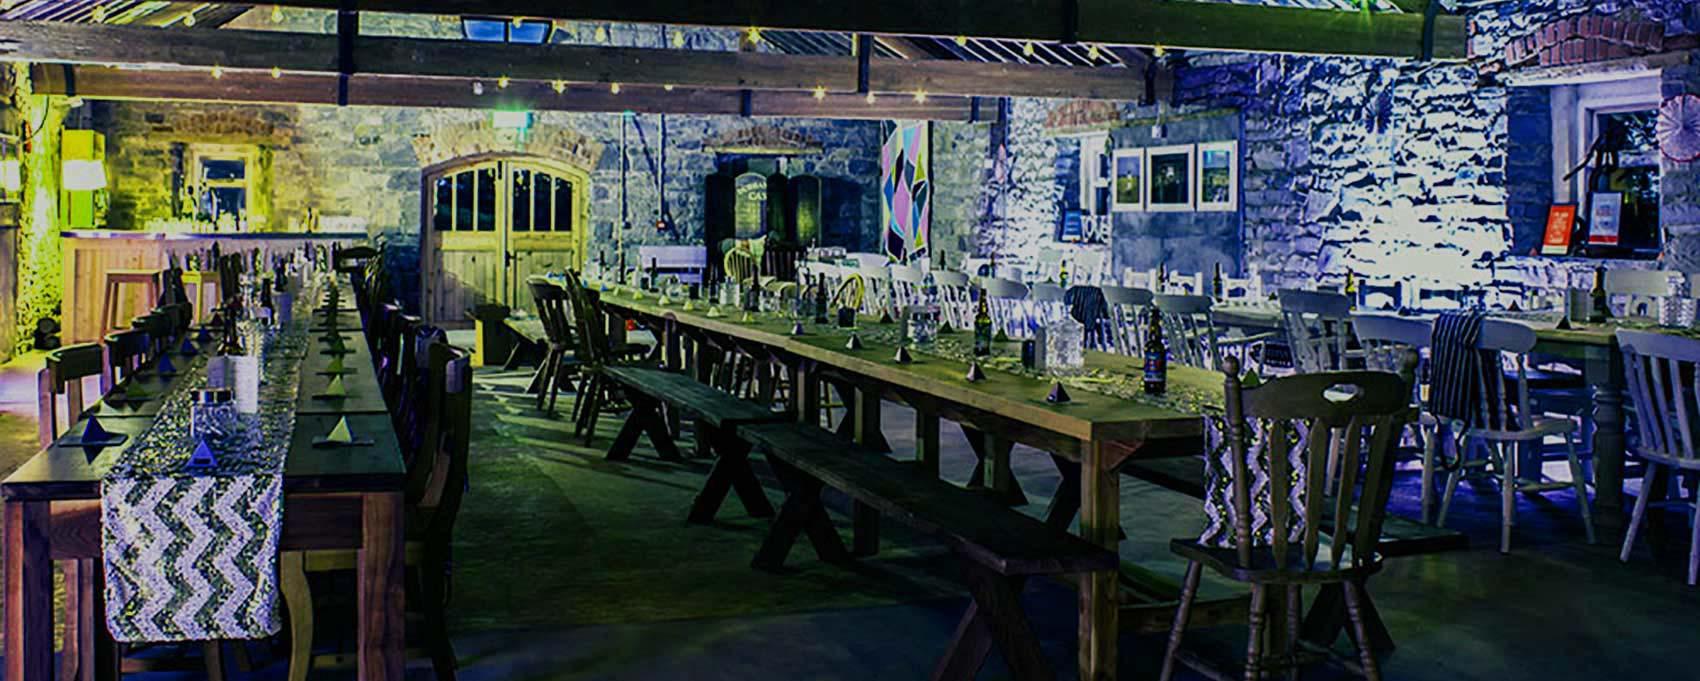 Durhamstown Castle wedding venue - great barn